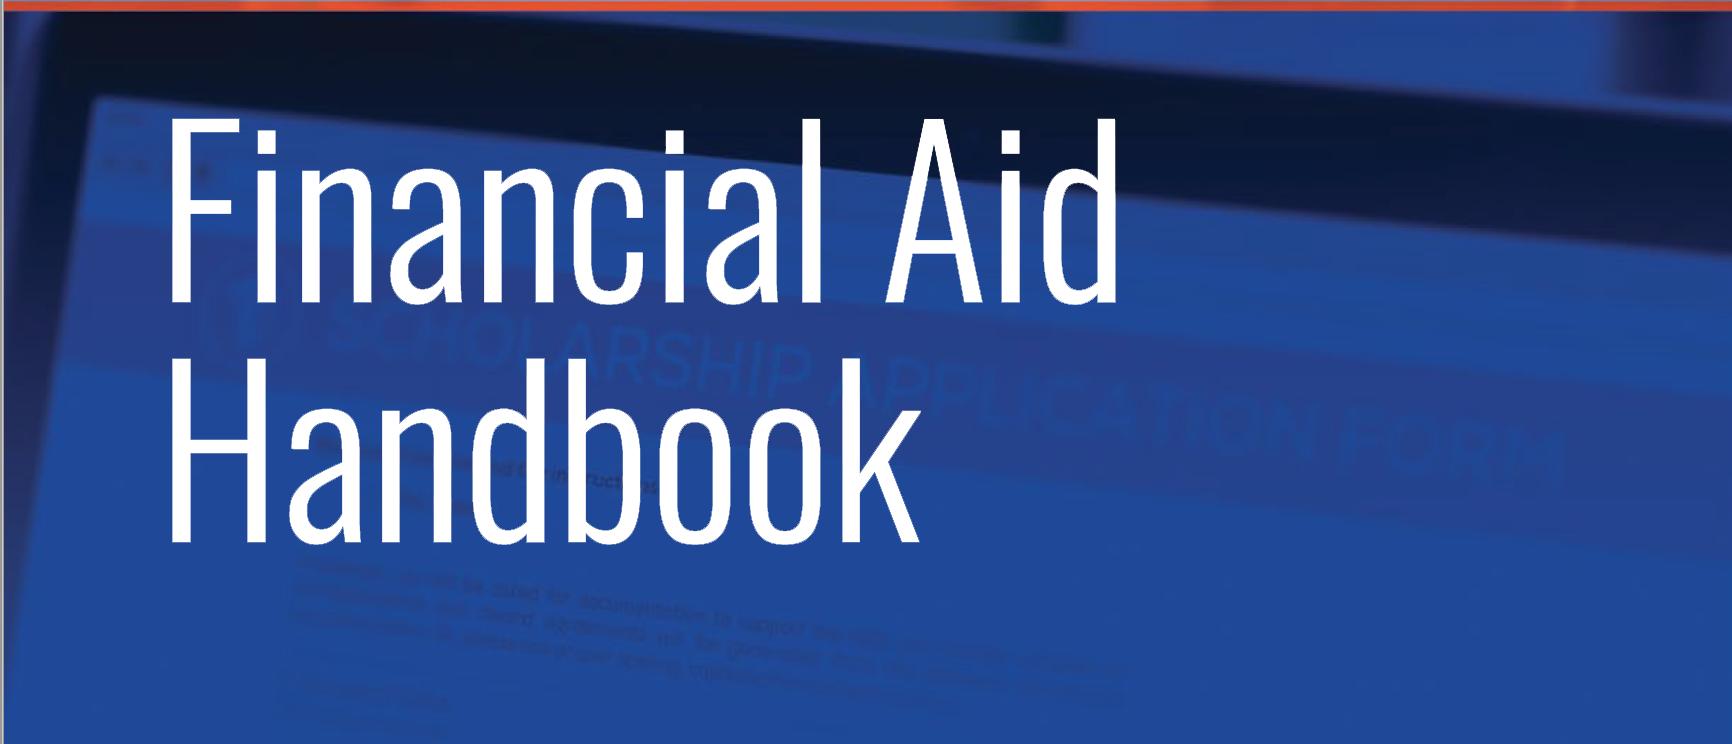 financial aid handbook image